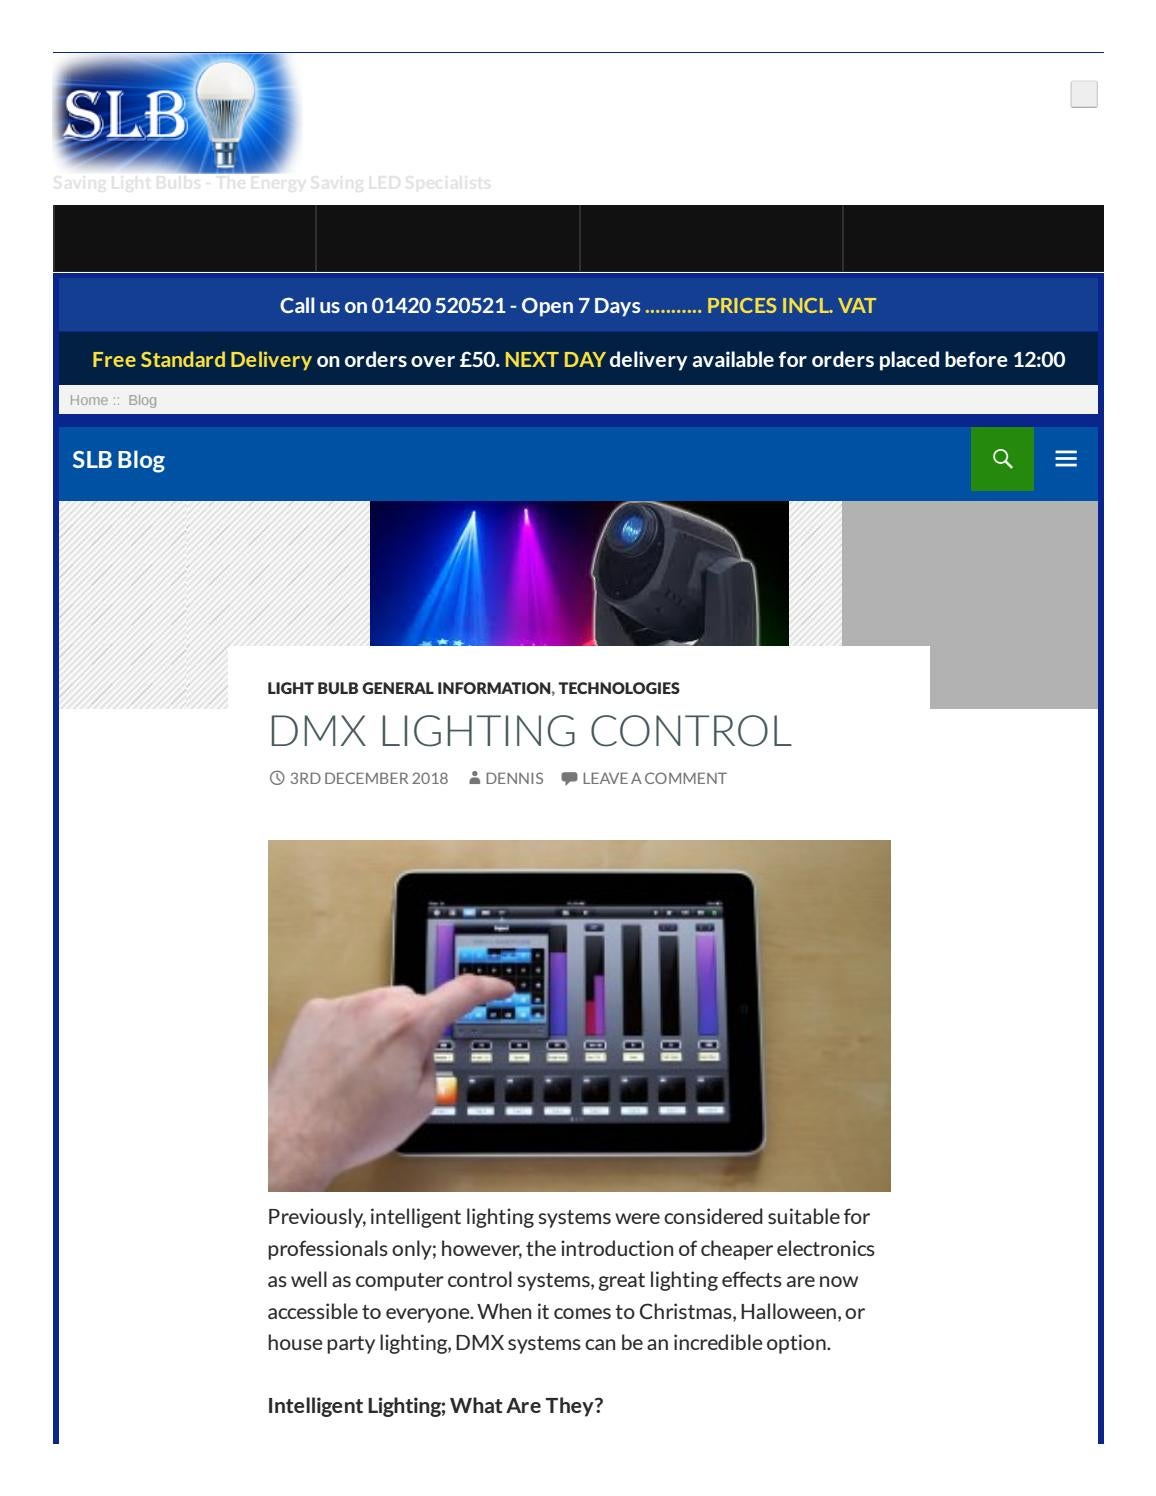 Dmx Lighting Control Saving Light